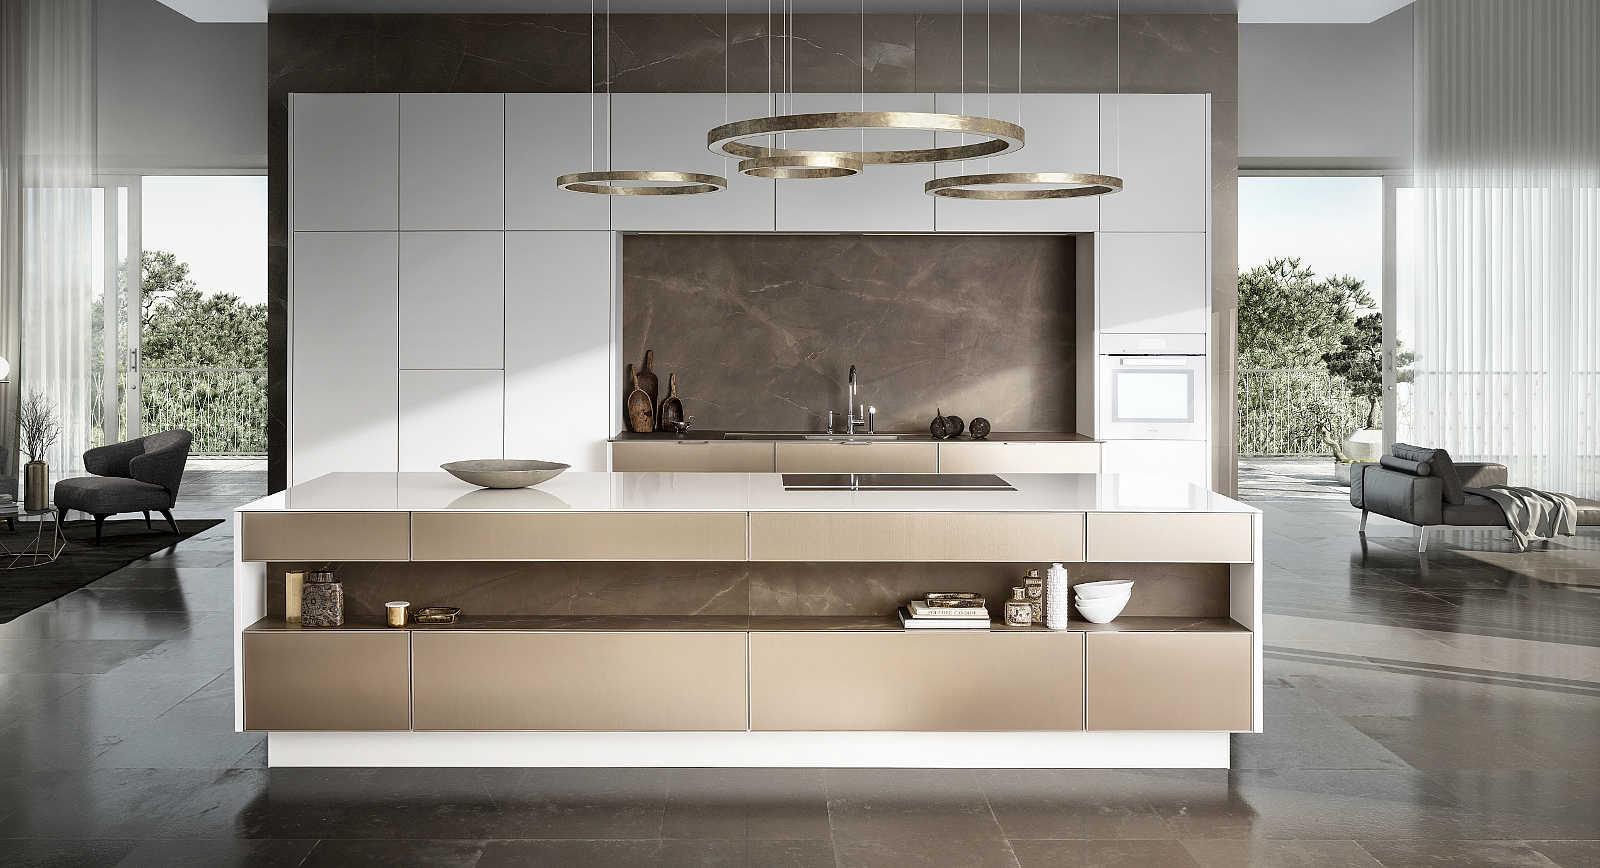 Küchen Bonn siematic küchen bonn köln küchen galerie bonn